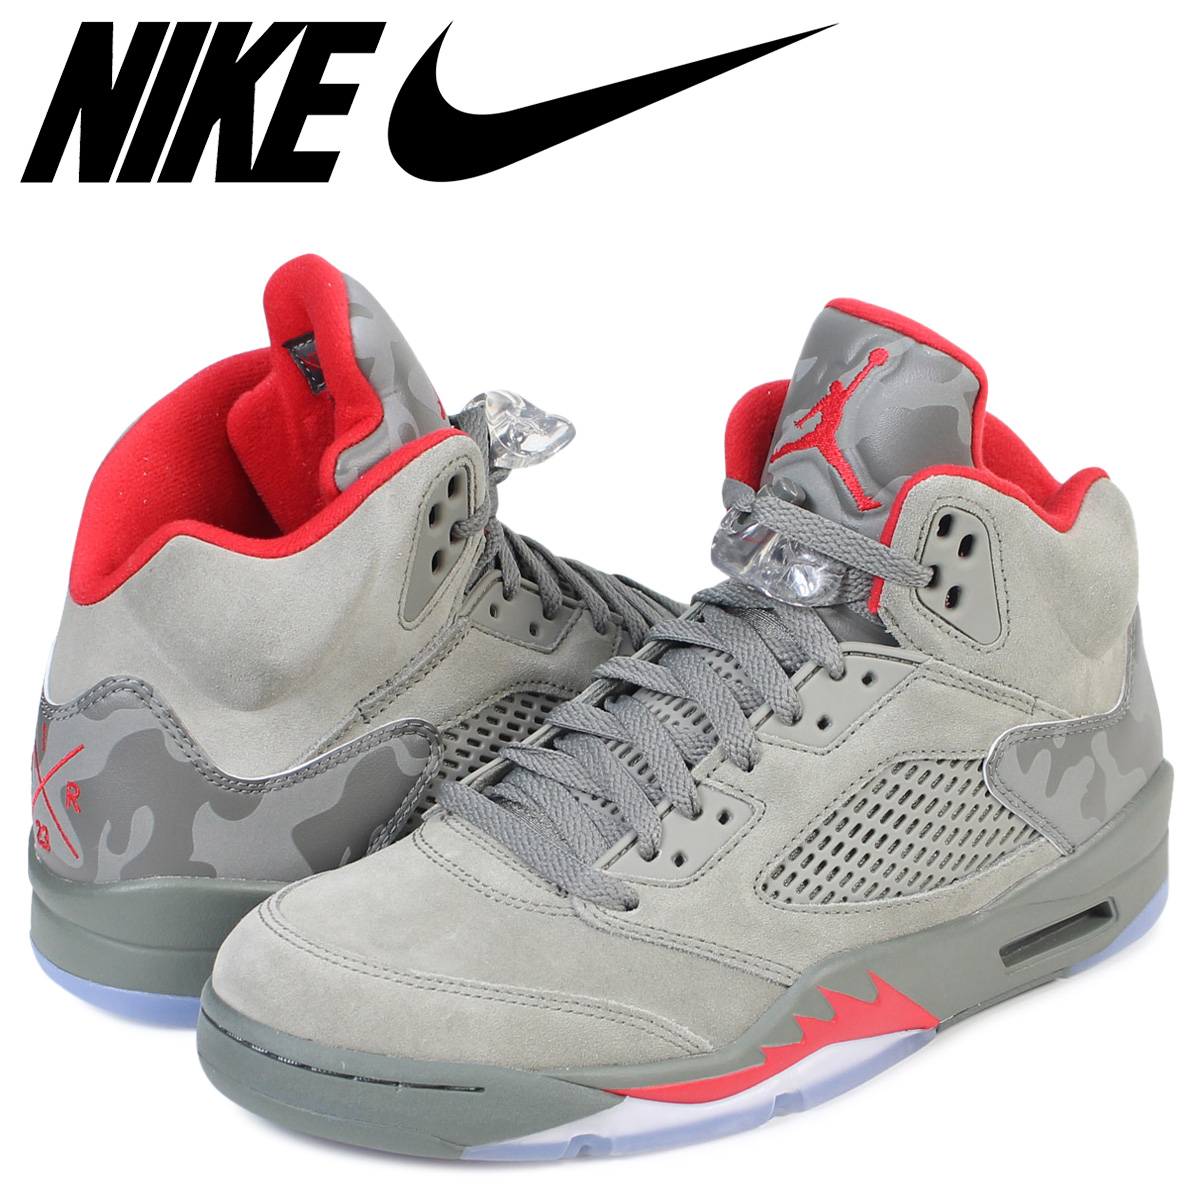 hot sale online 39643 76e12 NIKE Nike Air Jordan 5 nostalgic sneakers AIR JORDAN 5 RETRO 136,027-051  men's shoes olive